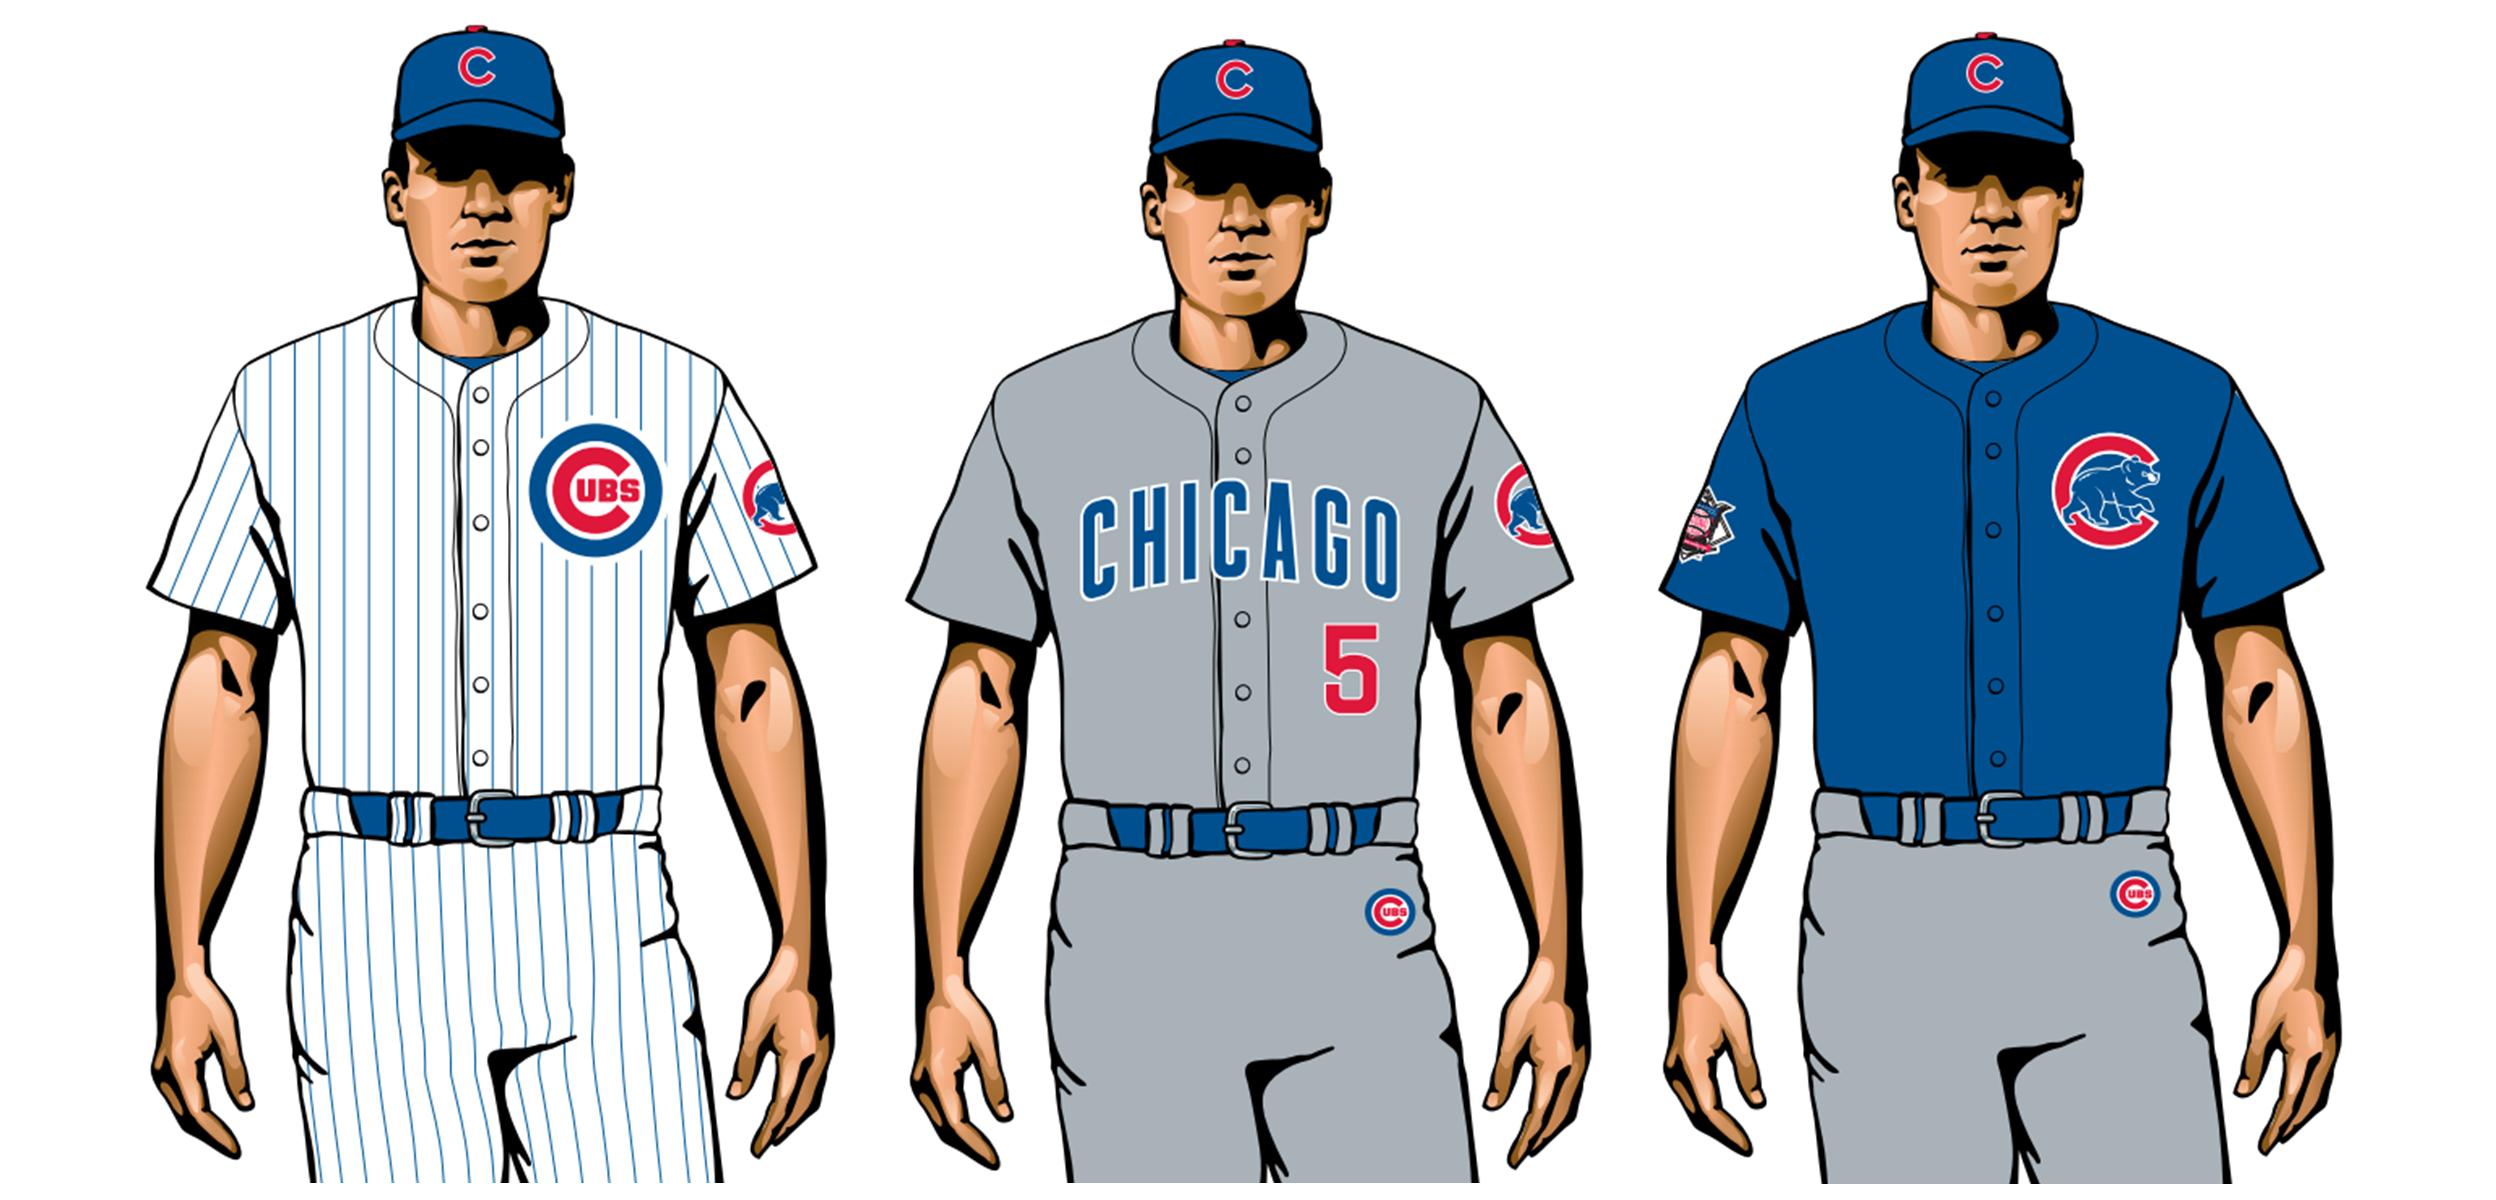 uniformes chicago cub 2020